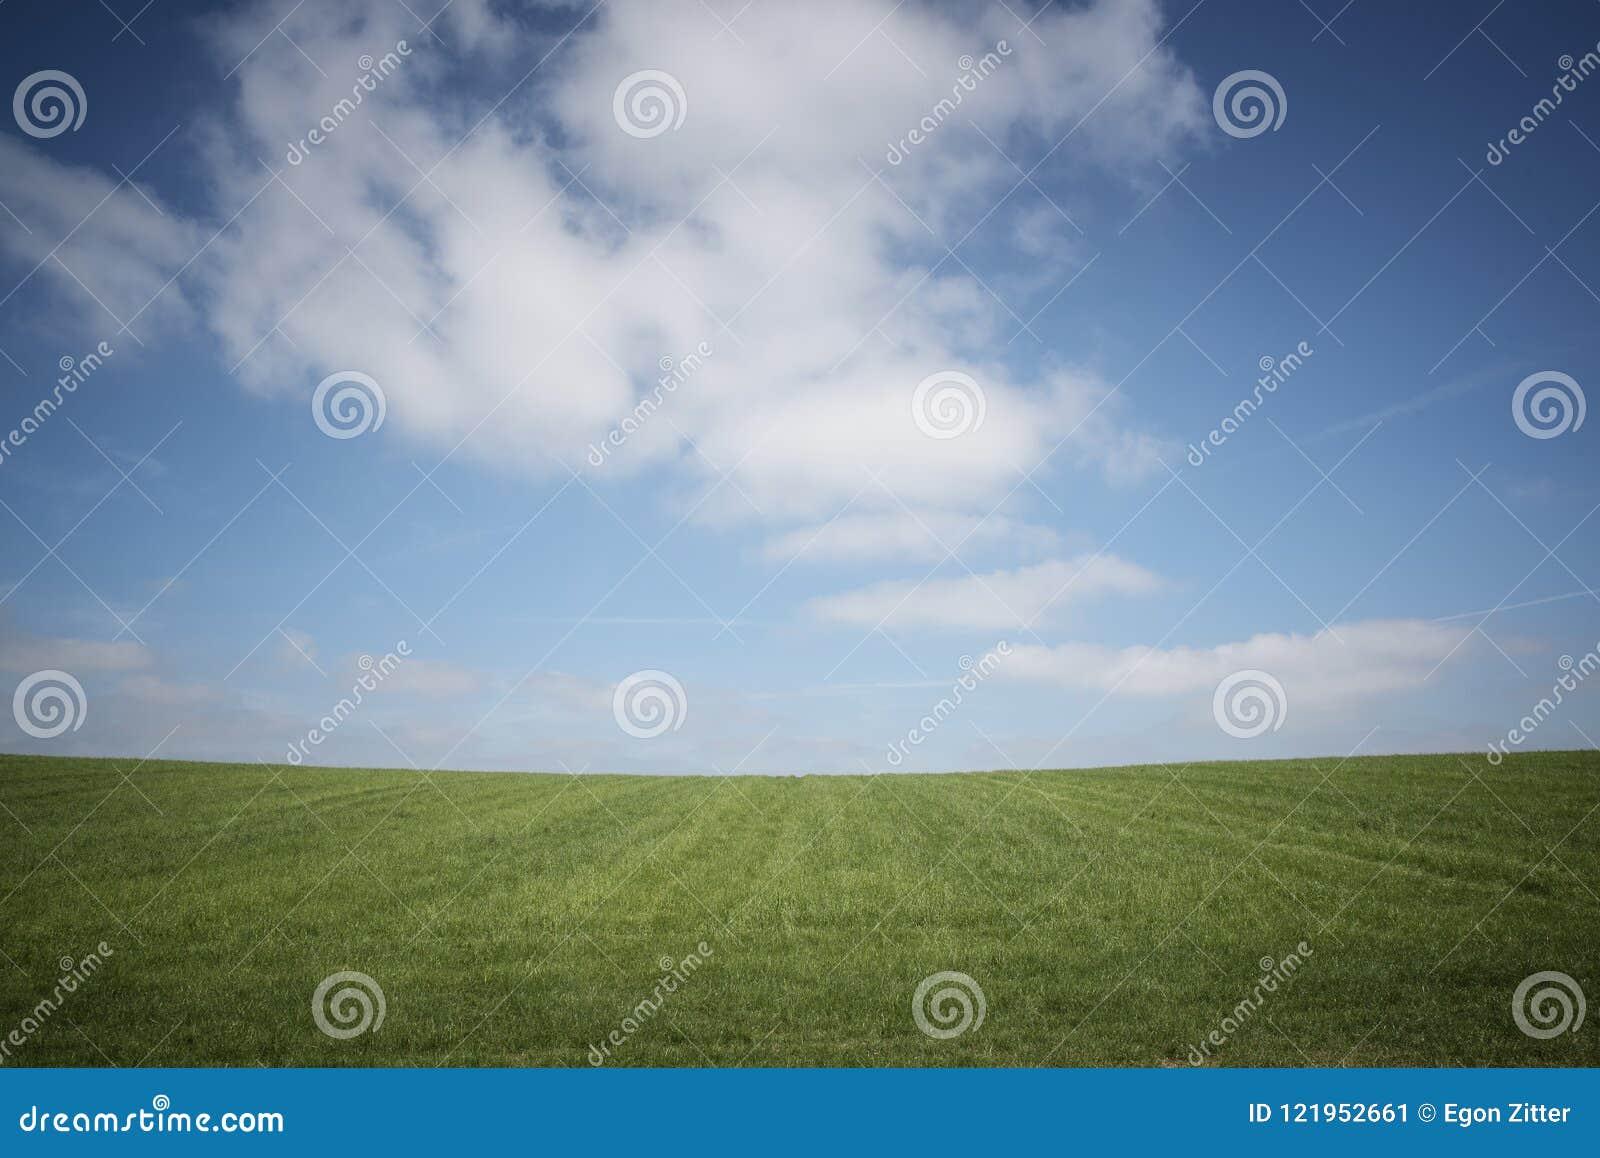 Ciel bleu, herbe verte, nuages blancs